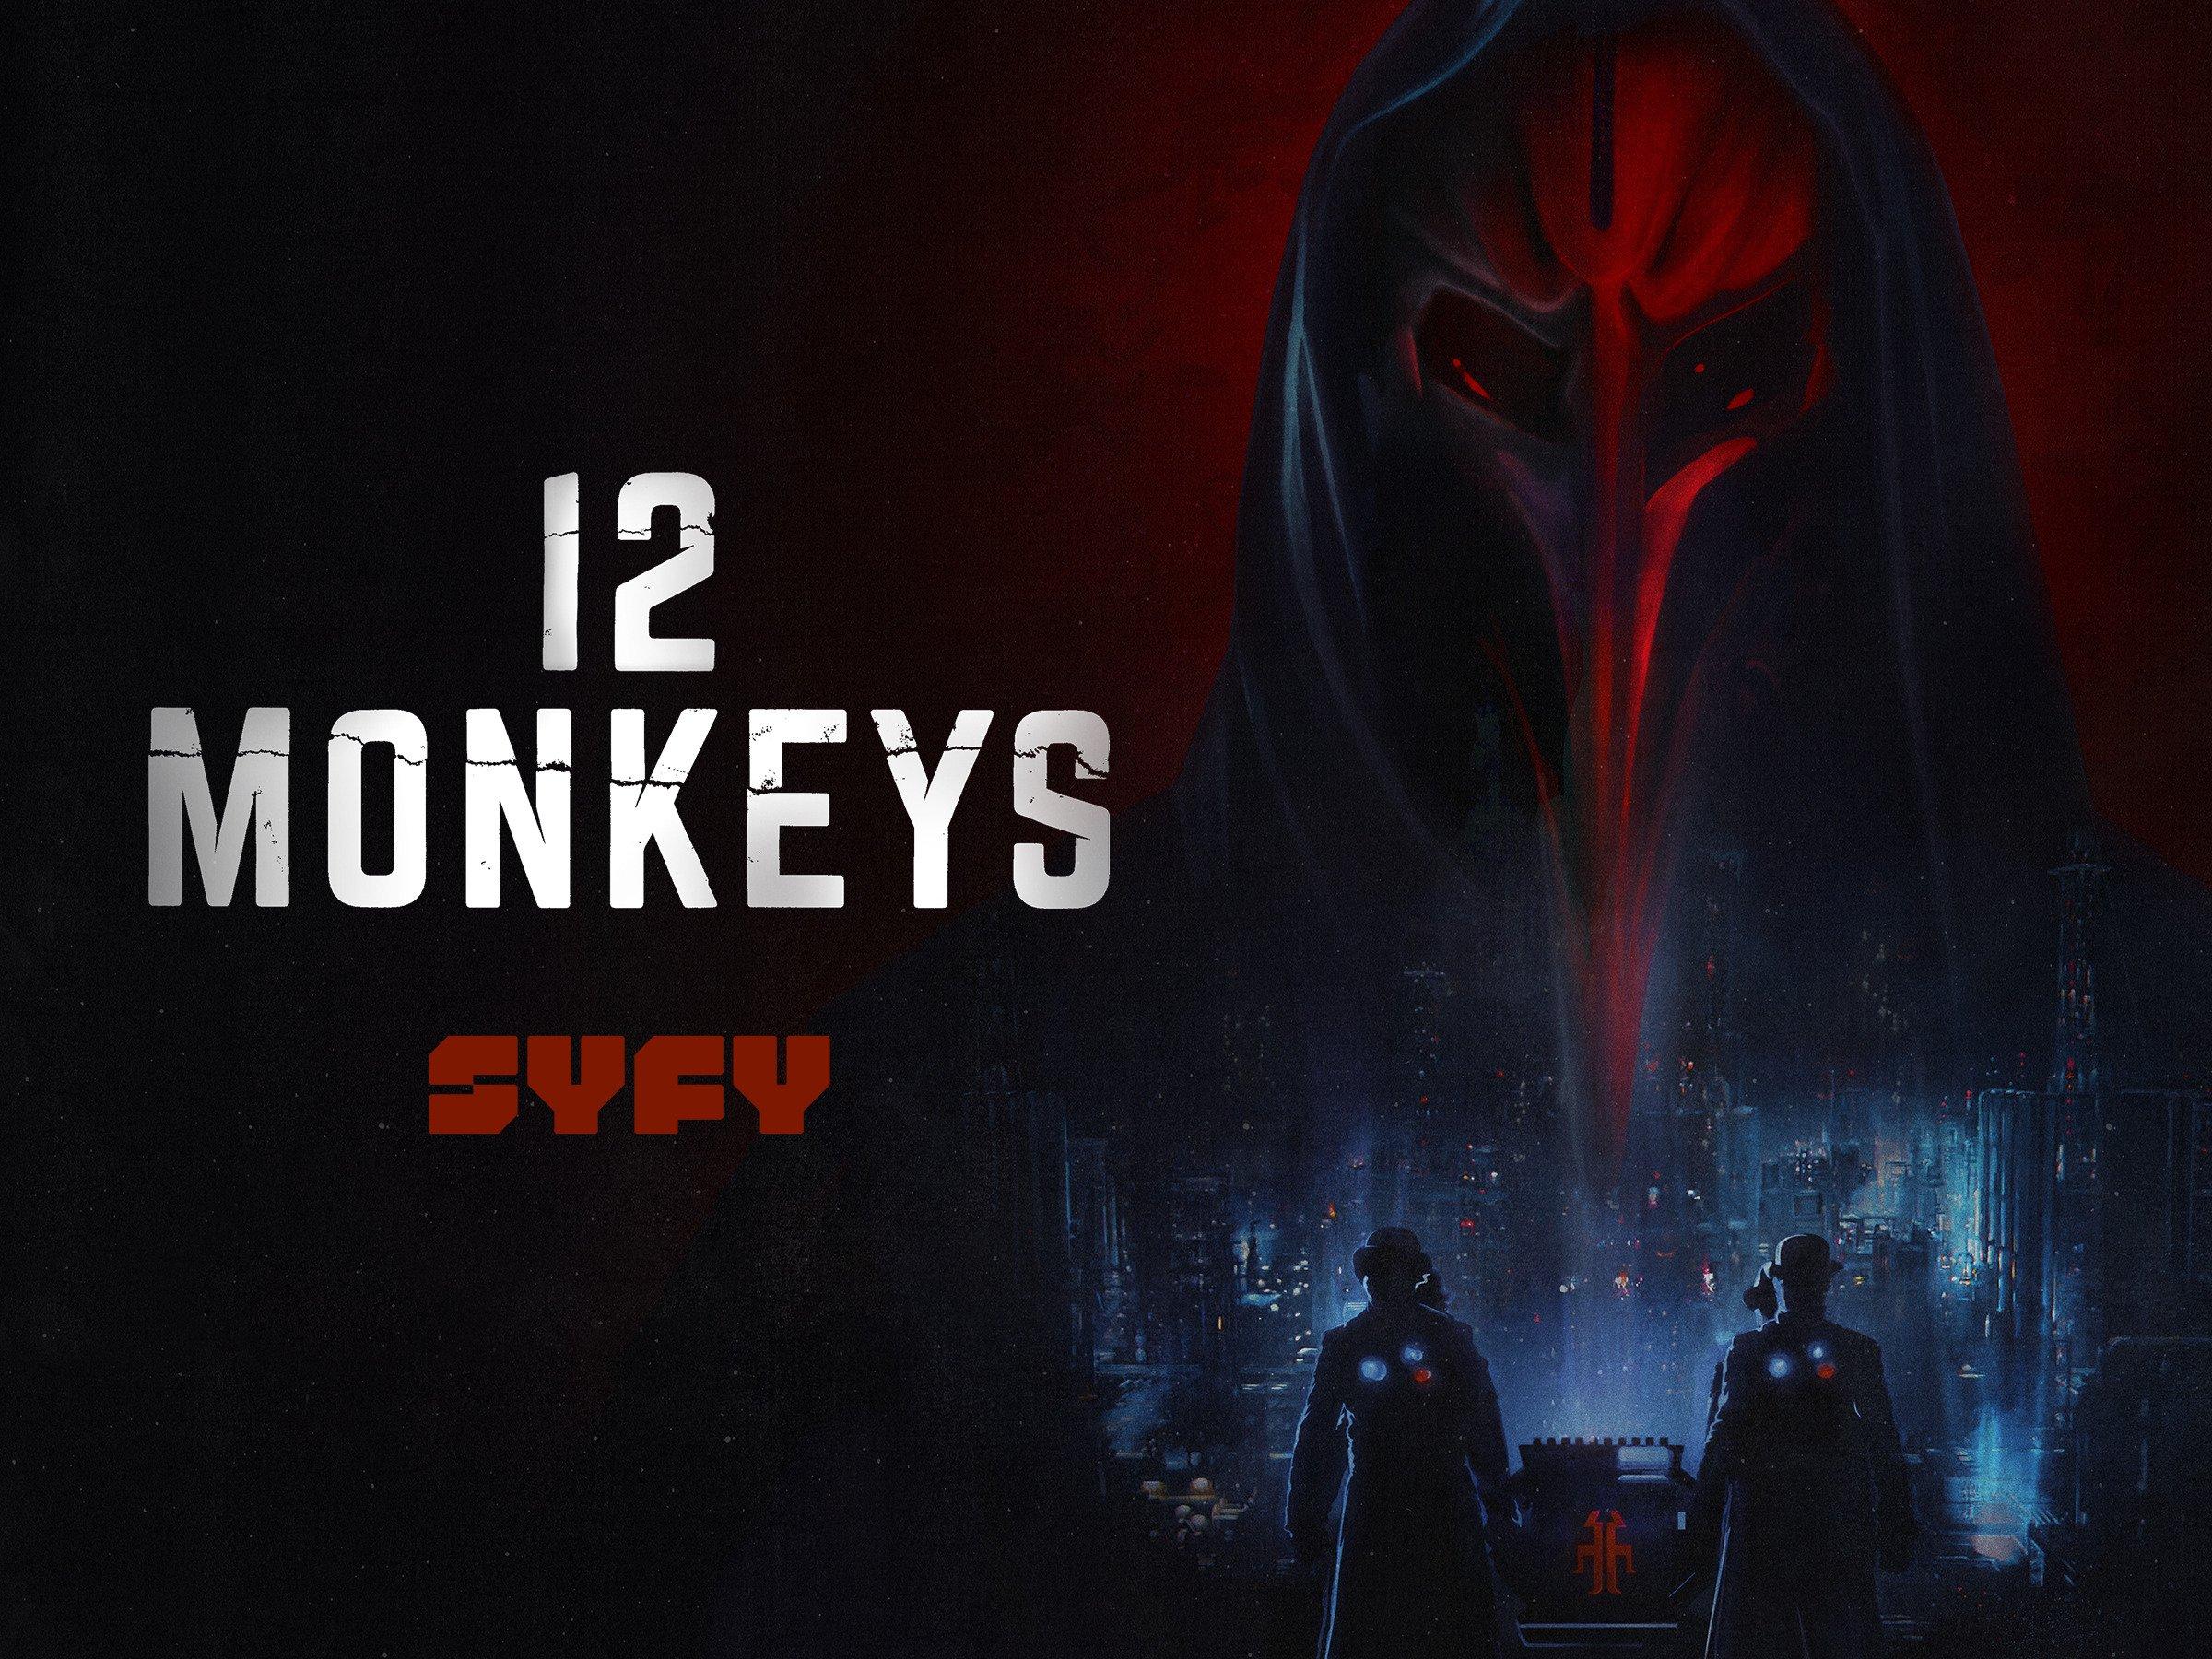 12 monkeys season 3 episode 1 stream